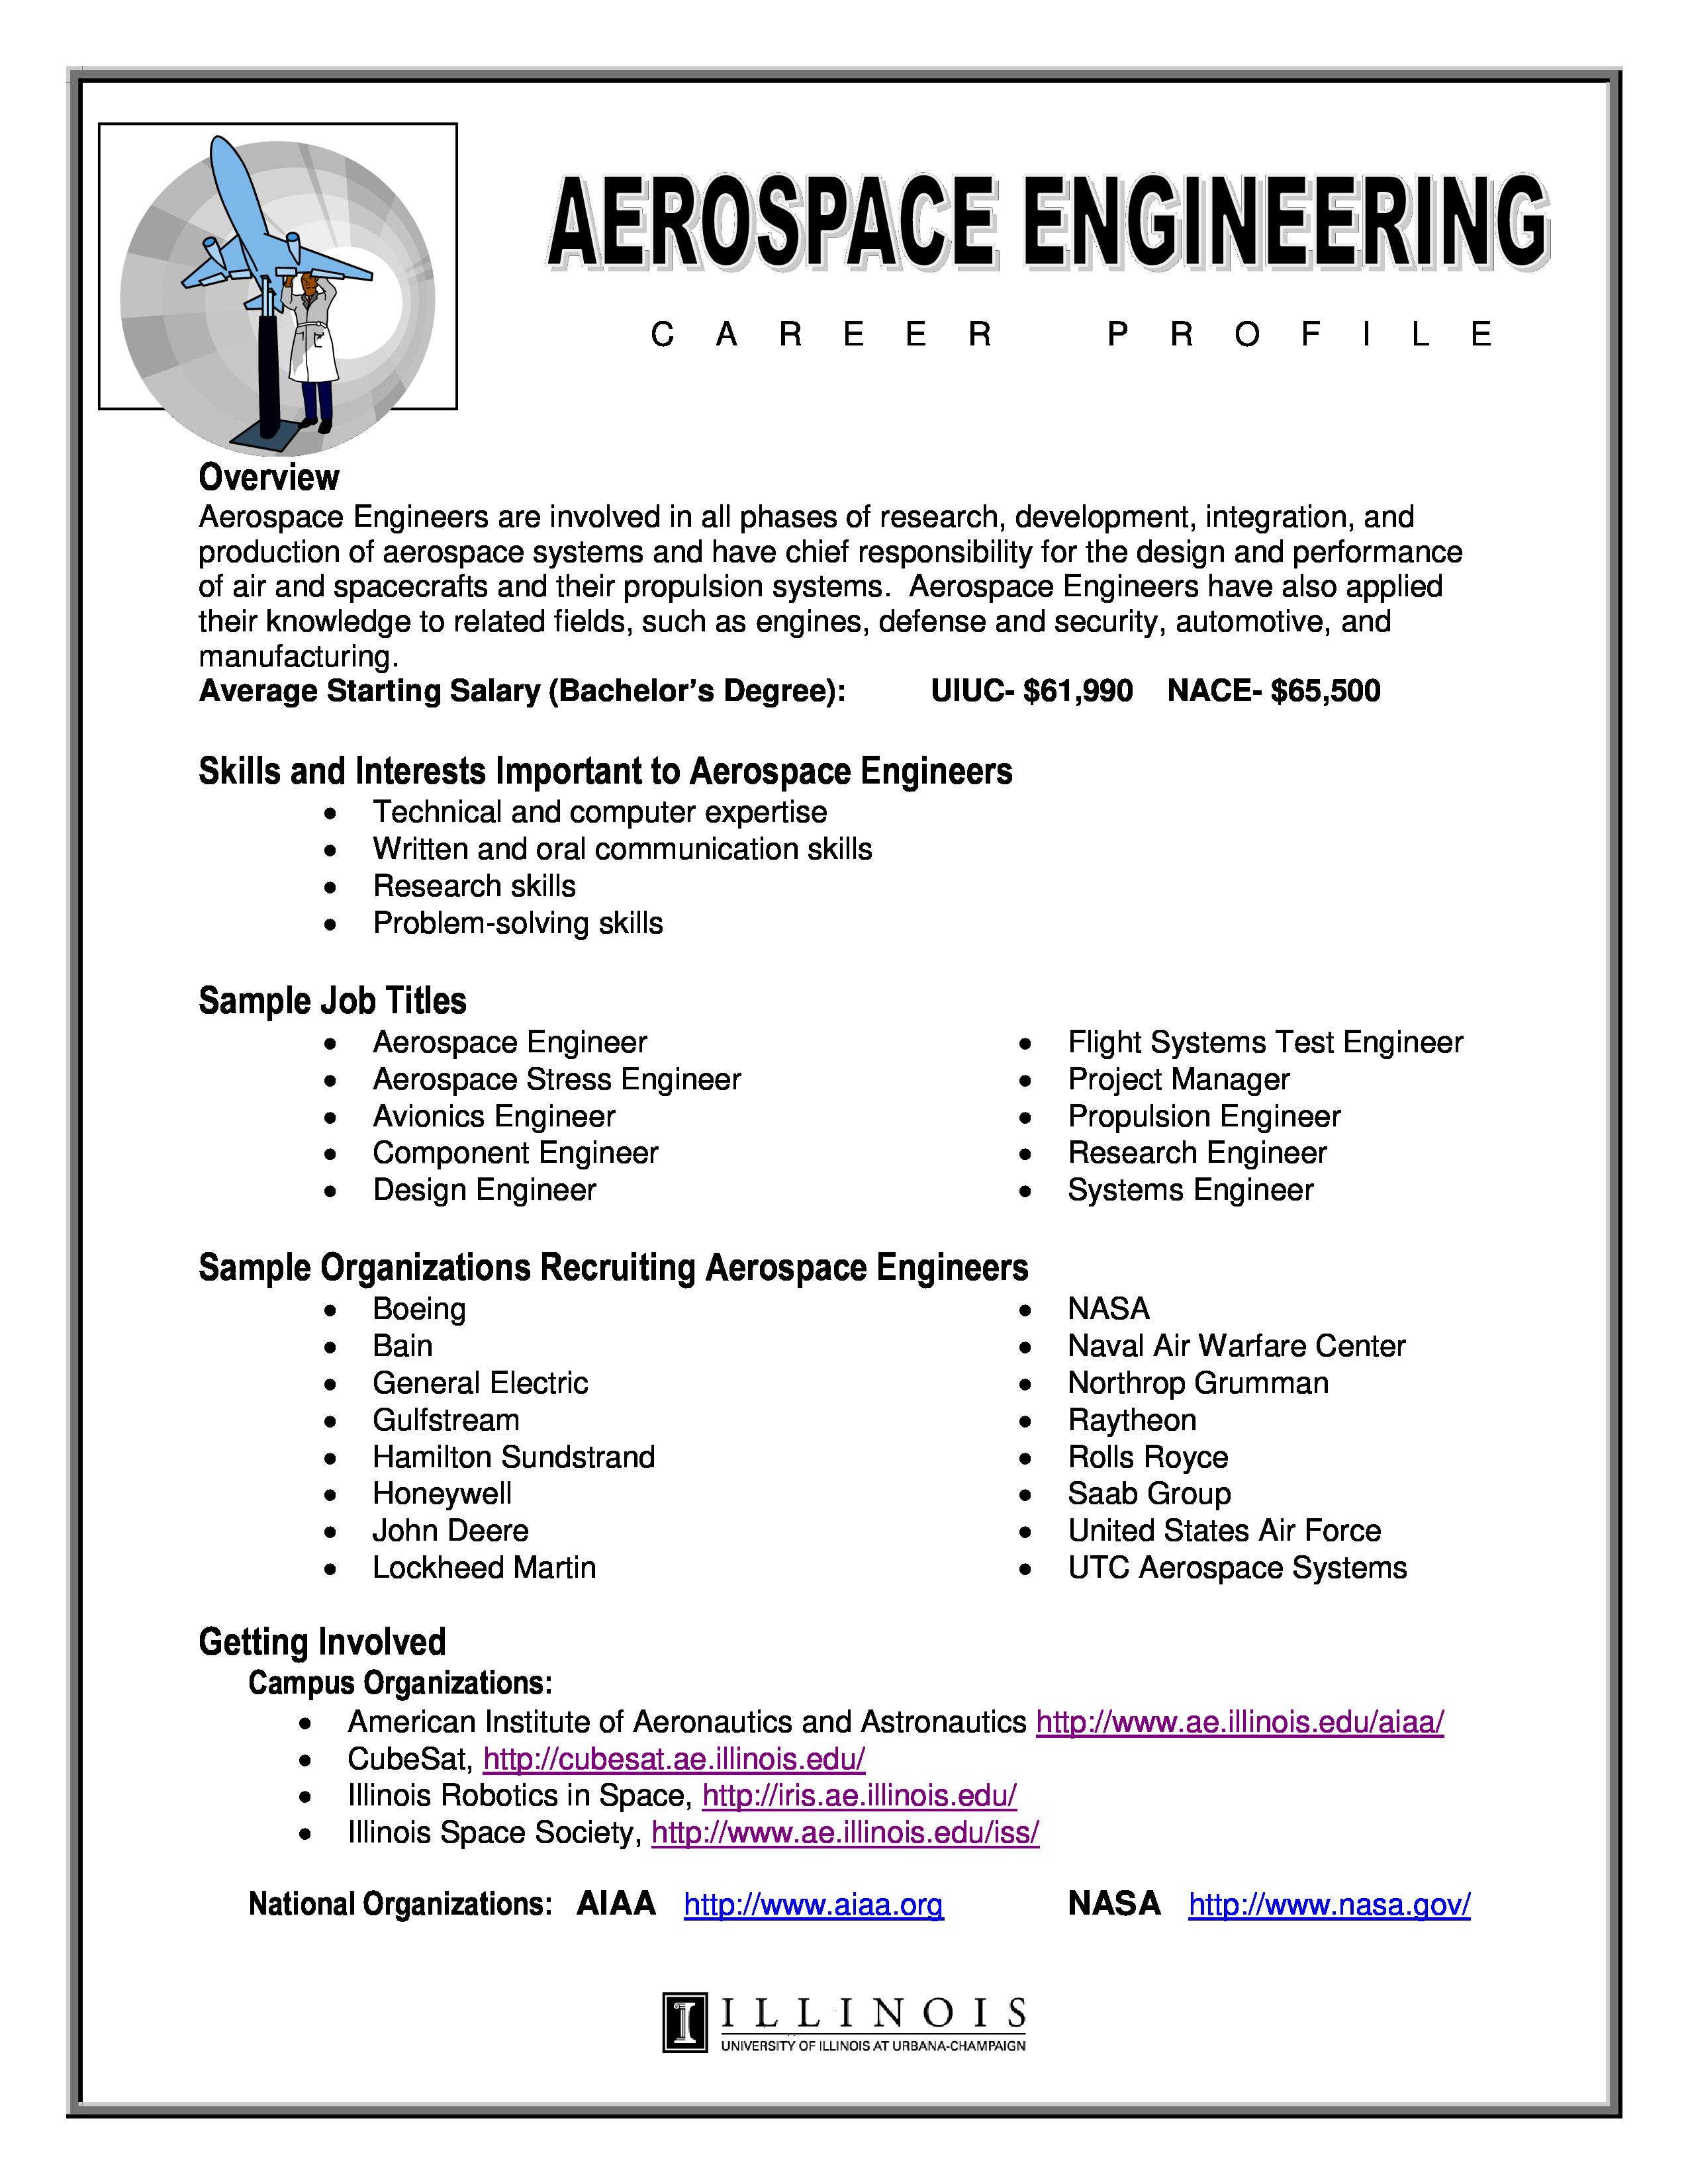 Experienced Aerospace Engineering Resume How To Draft An Experienced Aerospace Engineerin Engineering Resume Templates Engineering Resume Engineering Careers